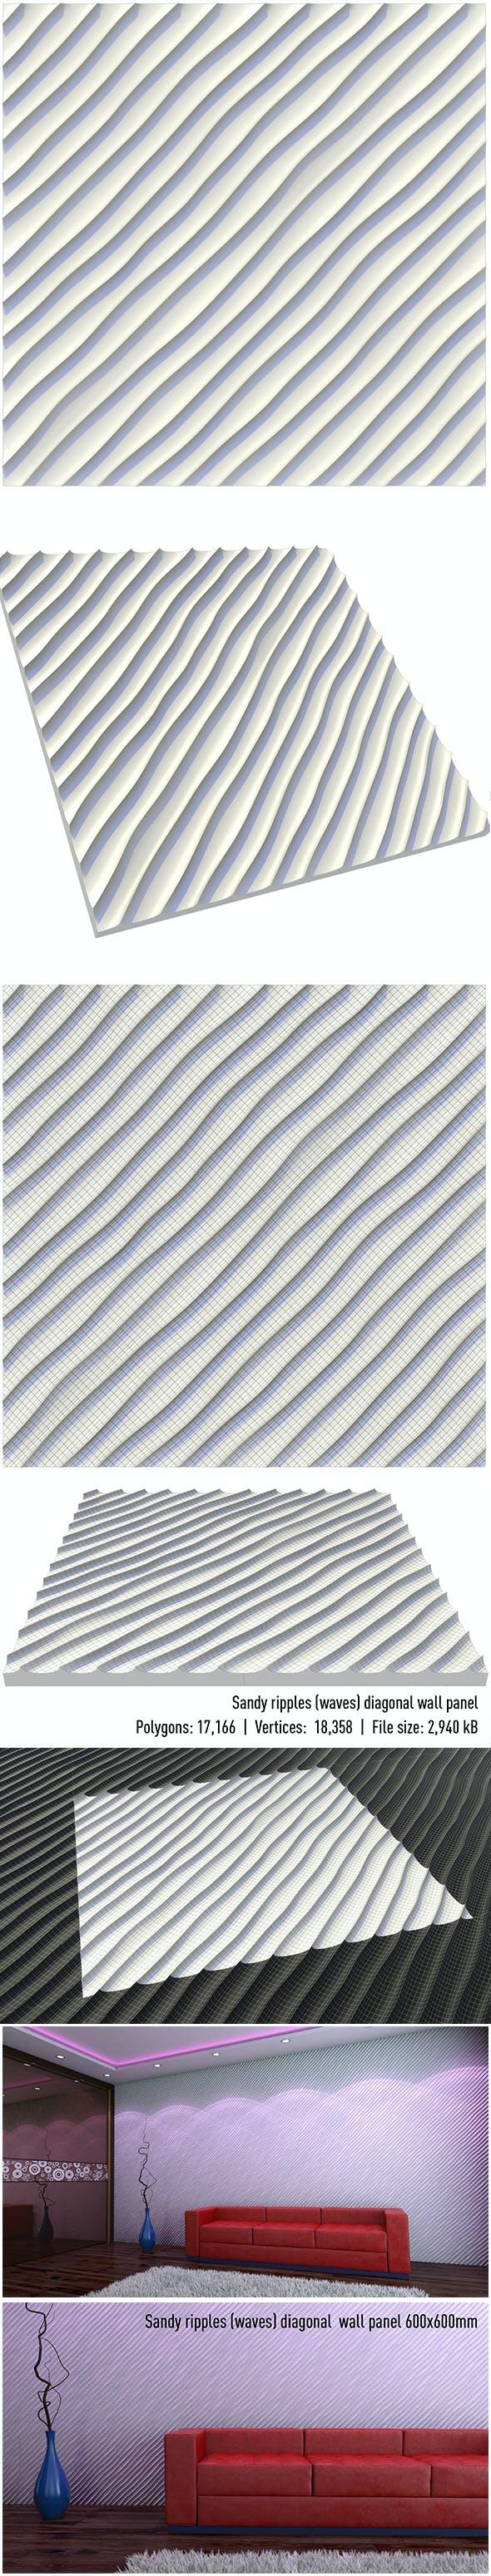 wall panel sandy ripples (waves) diagonal - 3DOcean Item for Sale